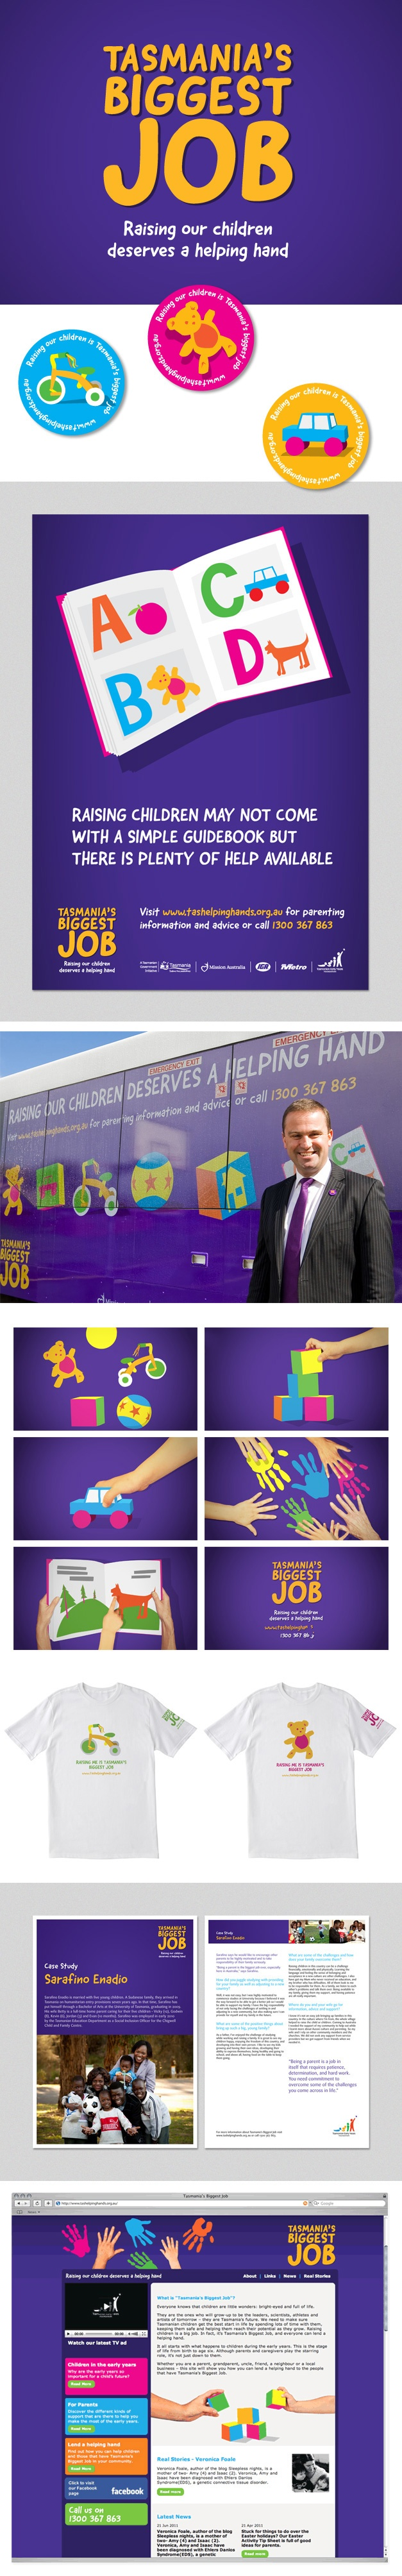 Branding, collateral, advertising and PR campaign for Tasmania's Biggest Job. www.fenton.com.au #communication #PR #branding #graphicdesign